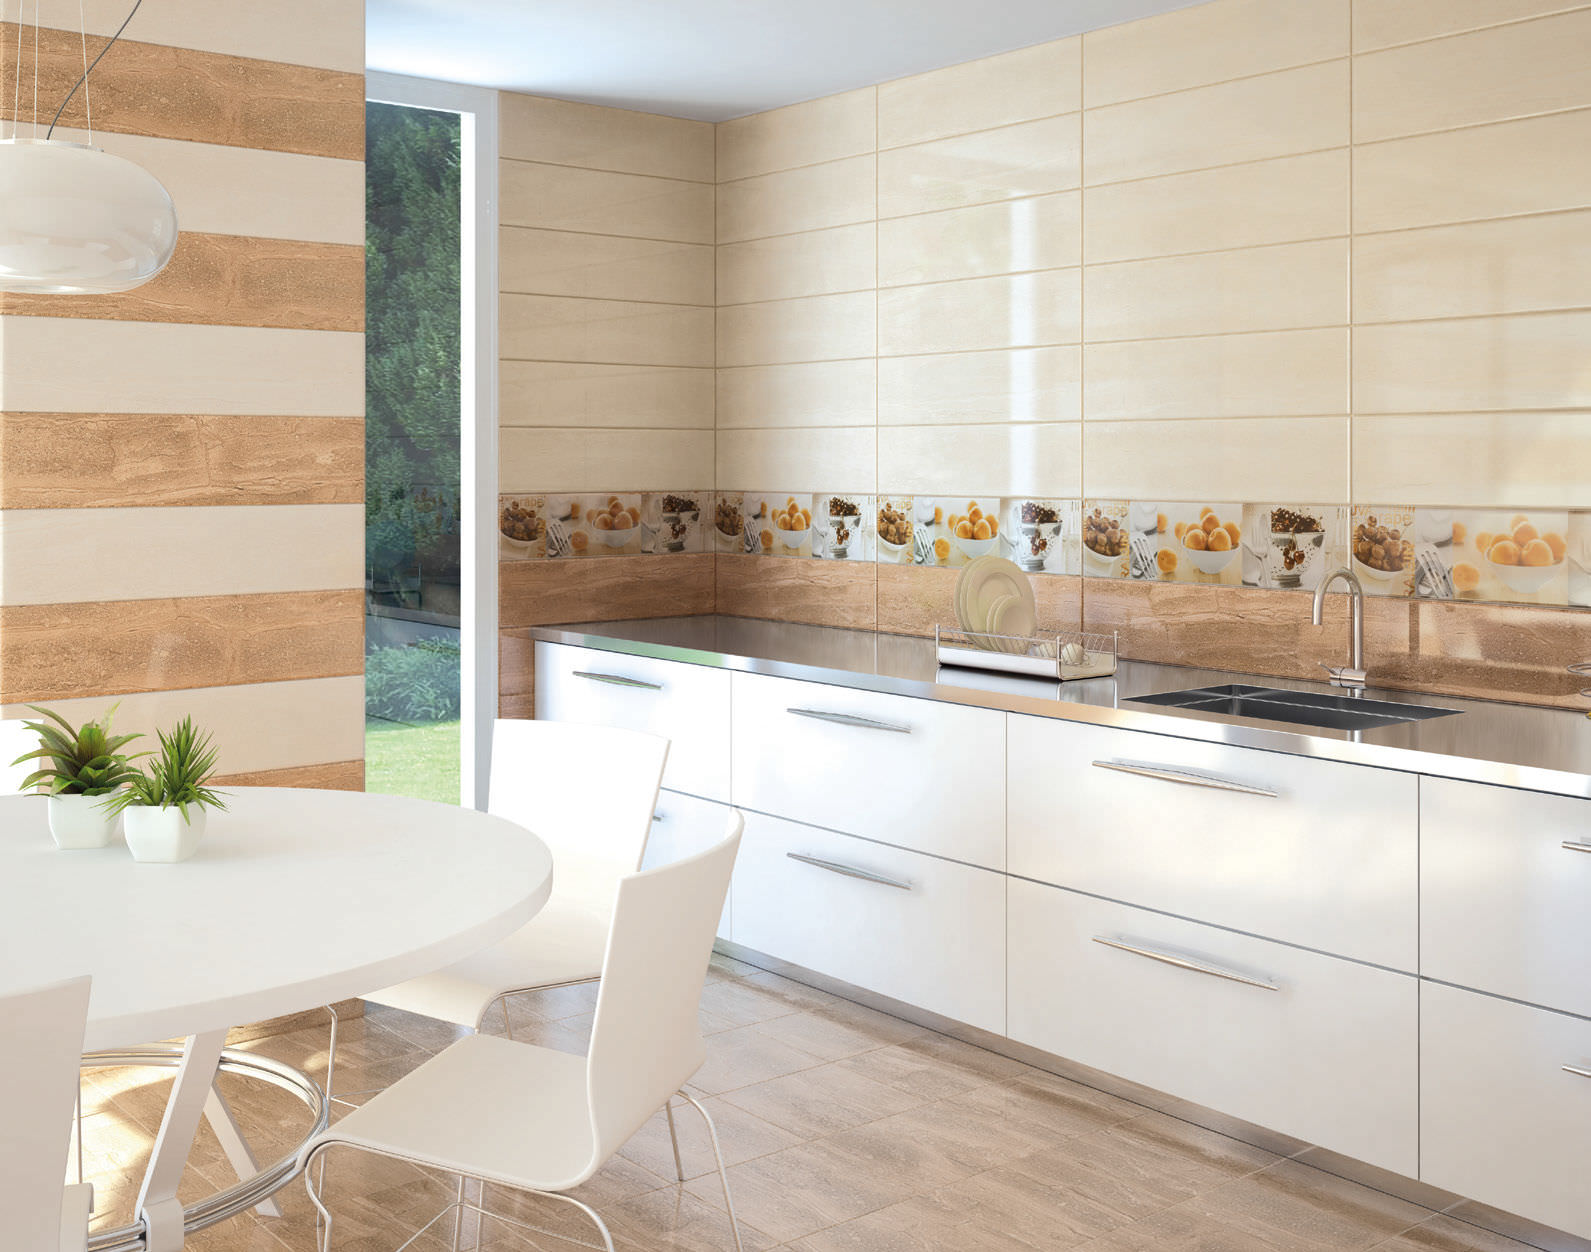 Polished Kitchen Floor Tiles Kitchen Tile Floor Ceramic Polished Daino Mayolica Azulejos